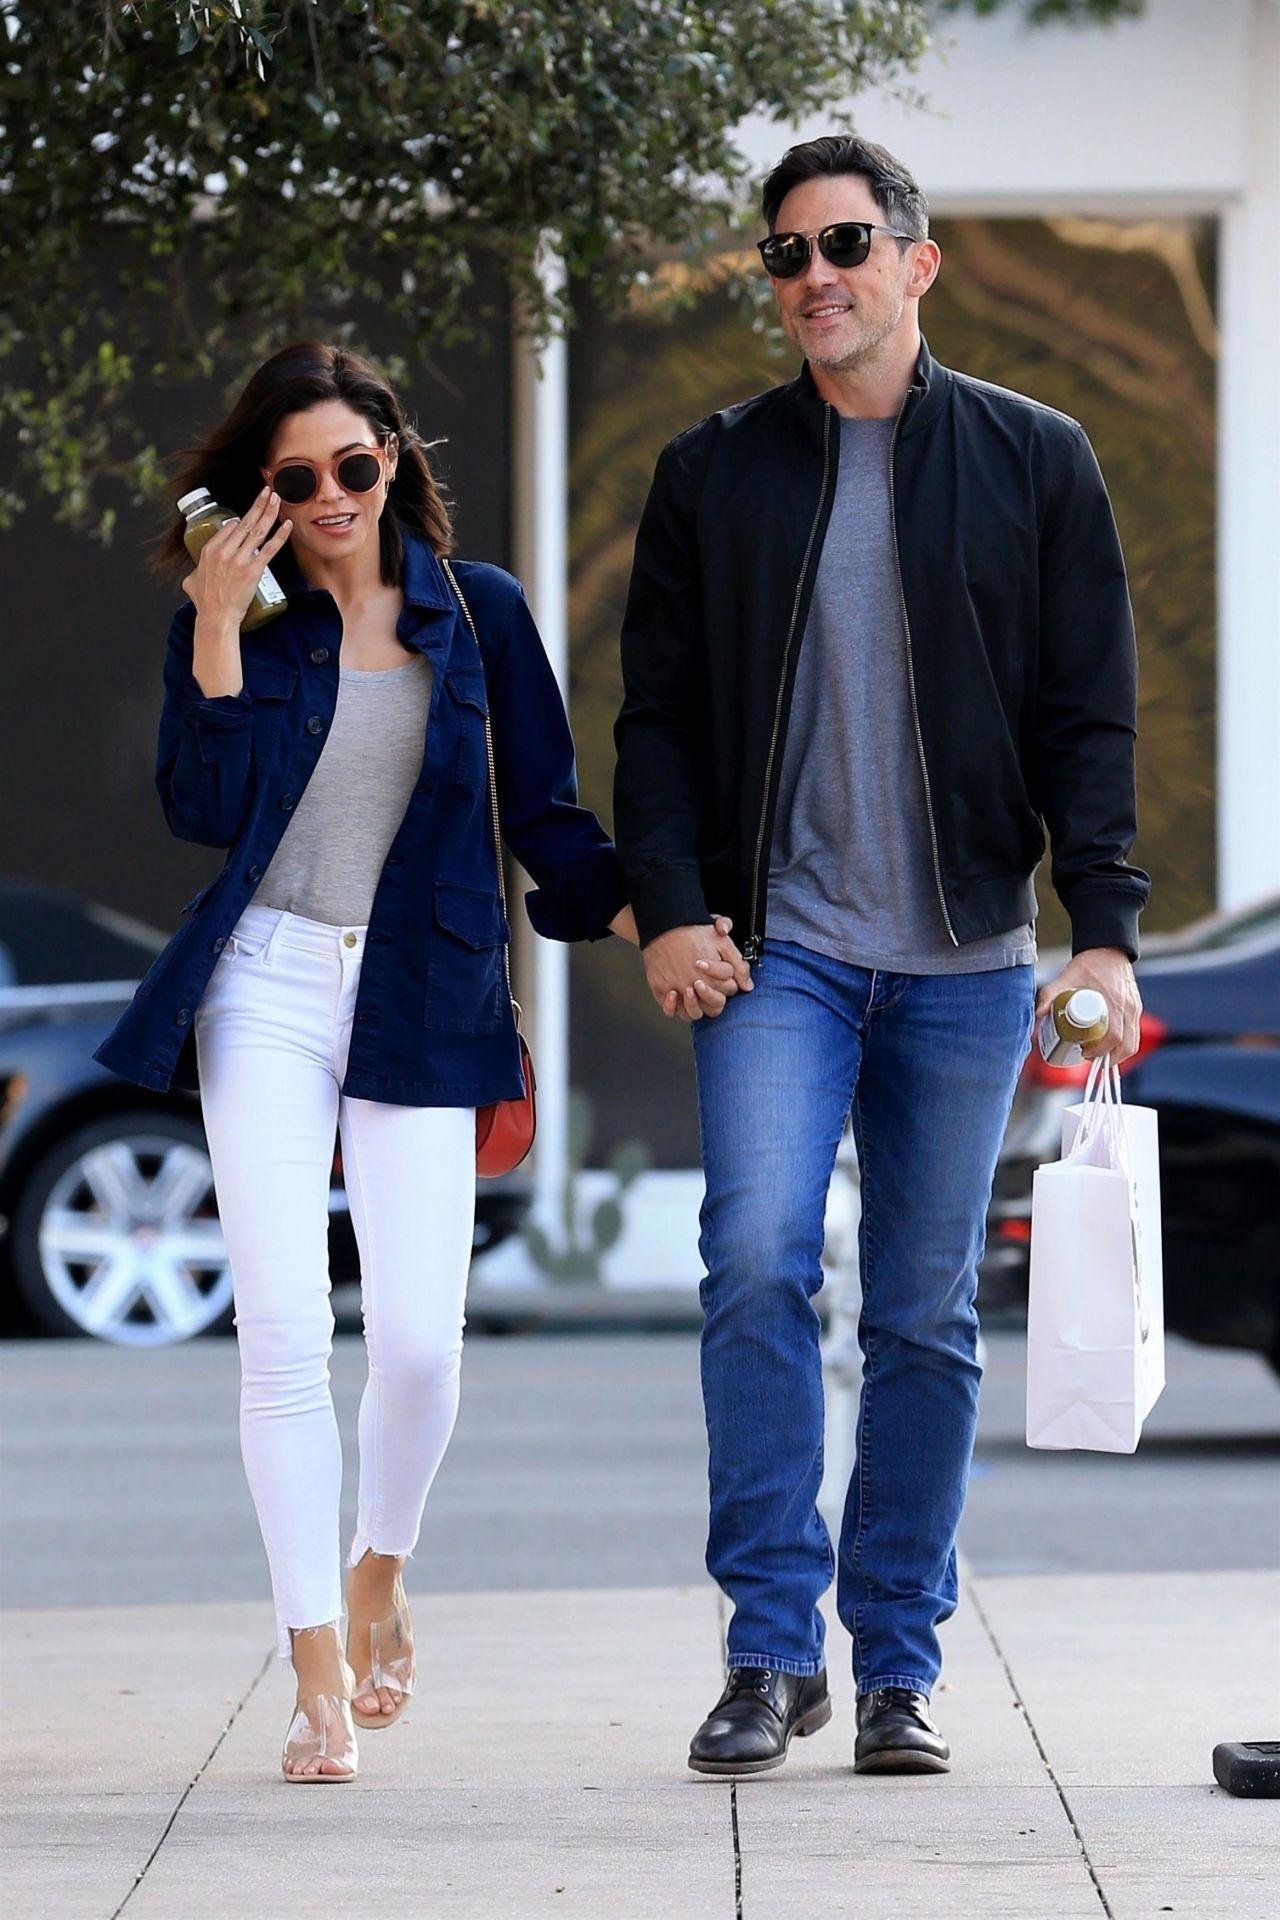 Jenna Dewan and Her New Boyfriend Steve Kazee at Pressed